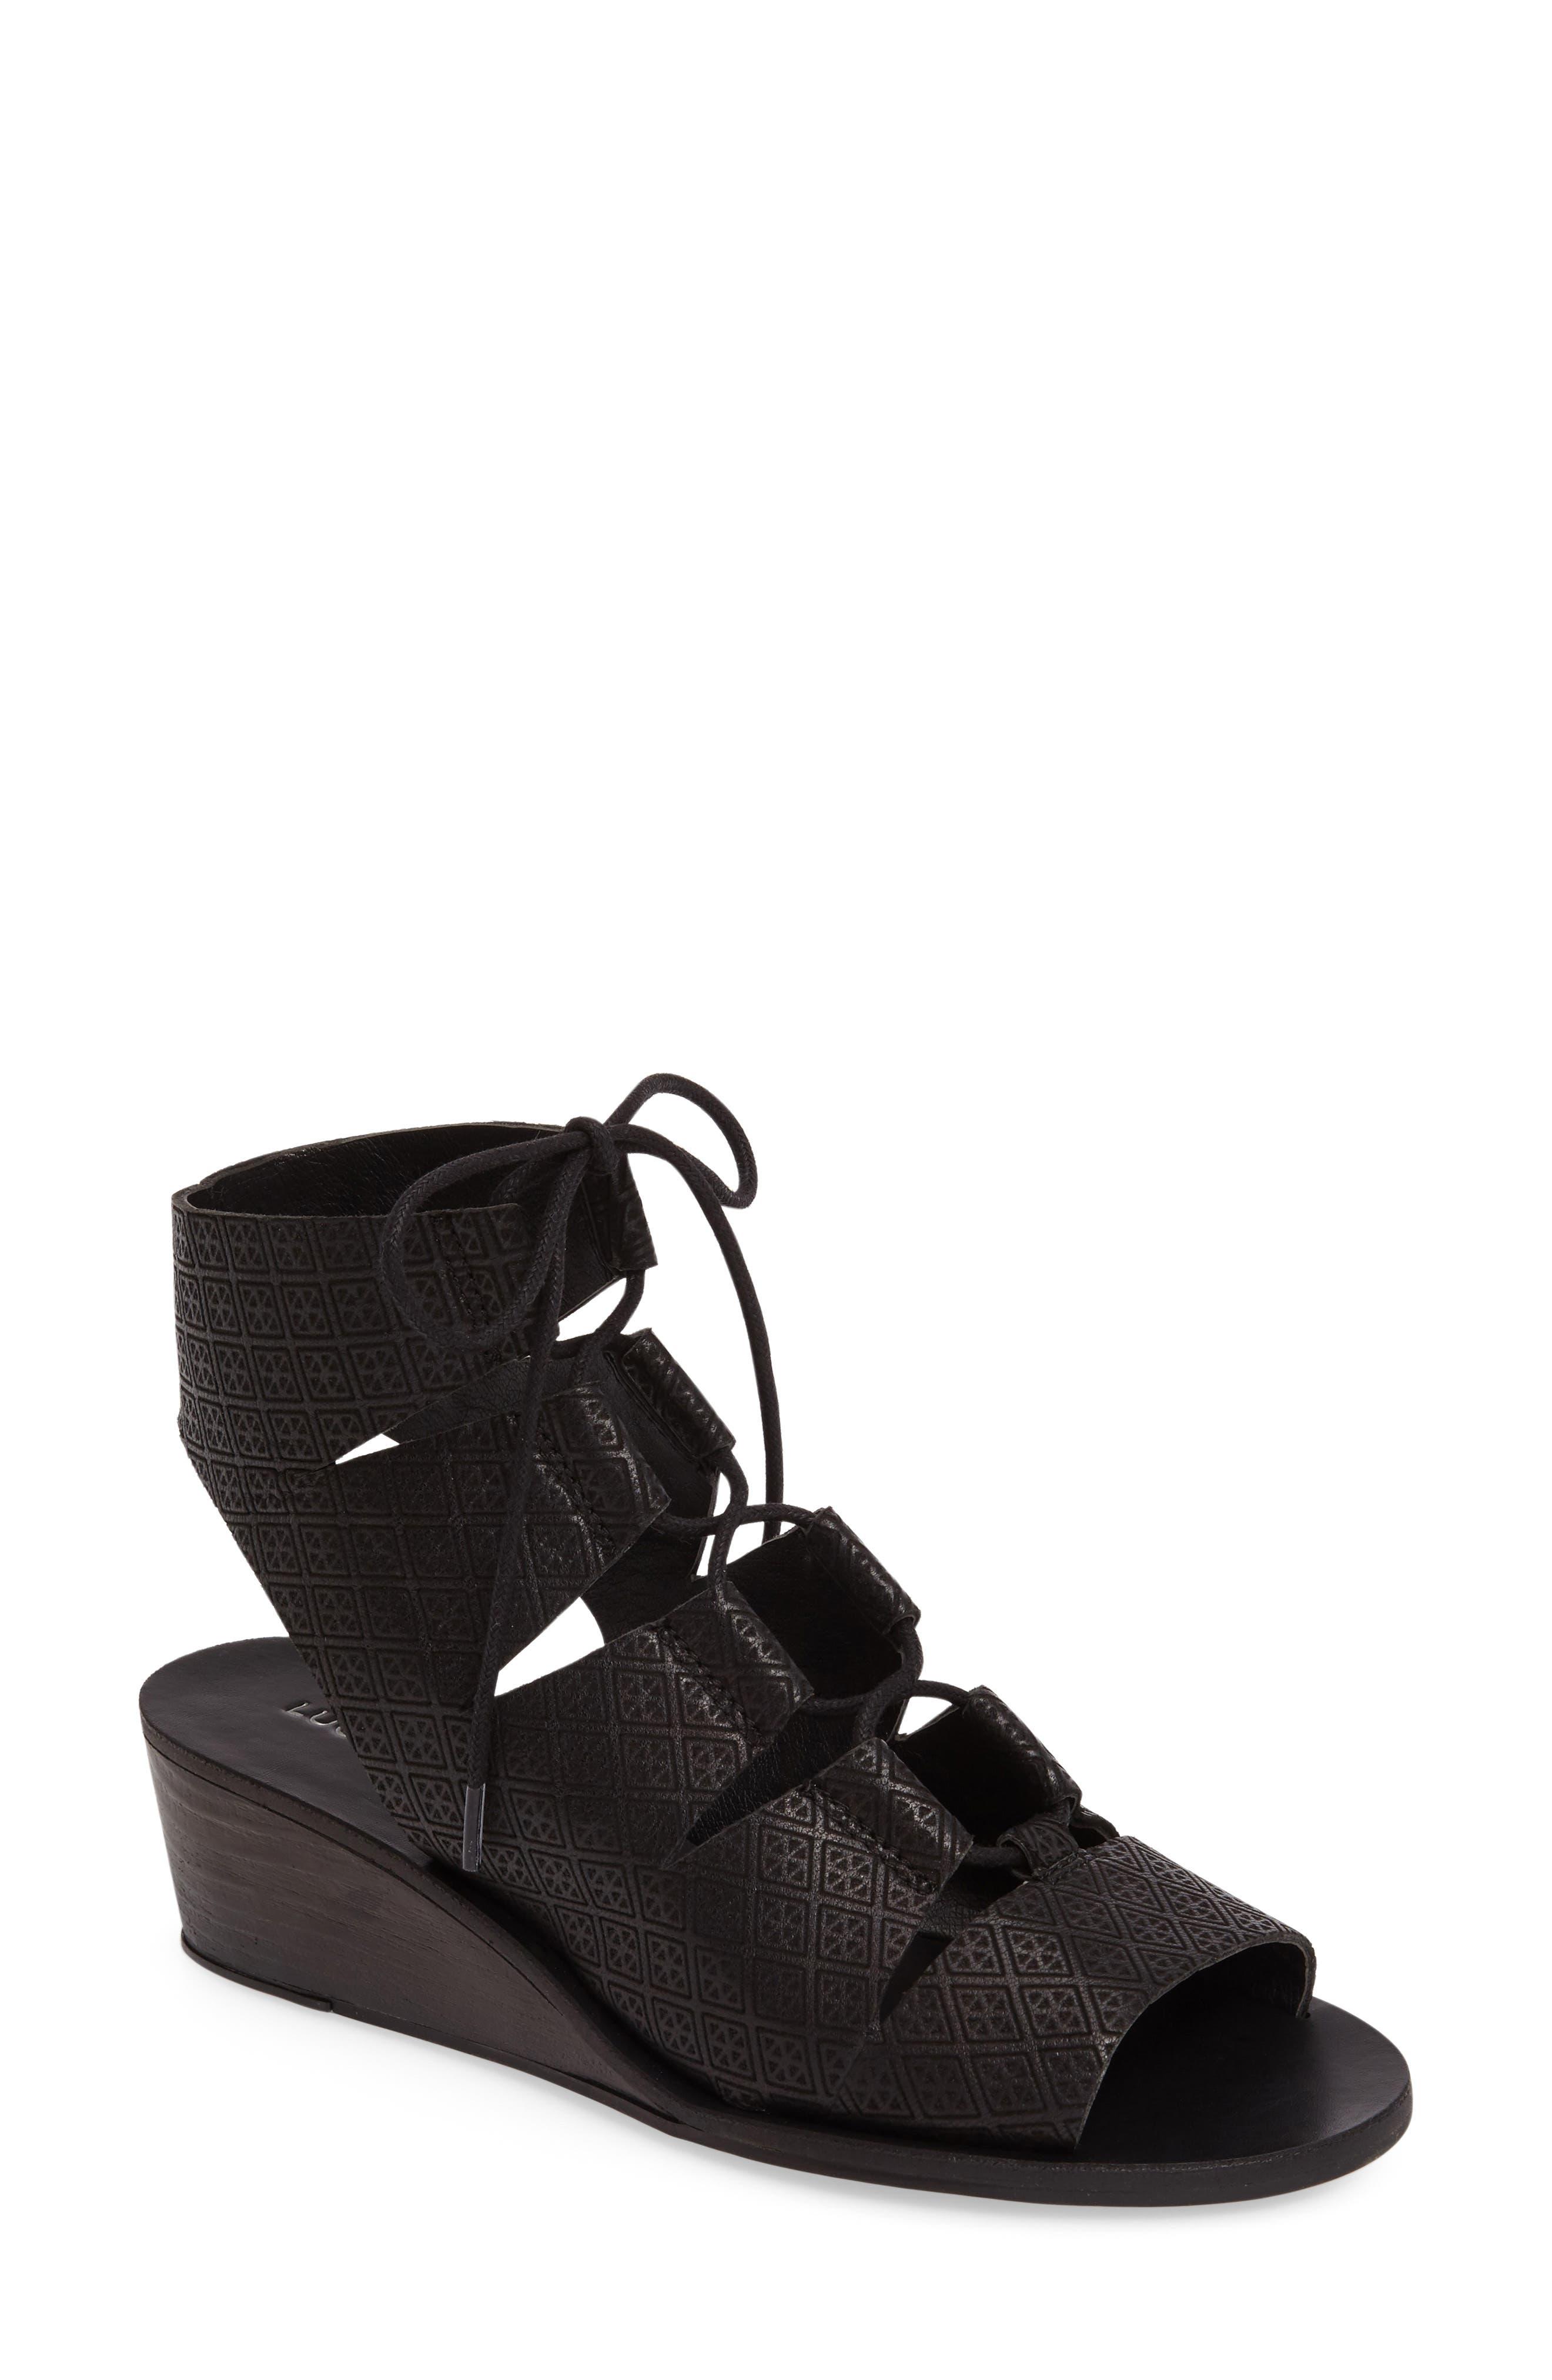 Gizi Wedge Sandal,                         Main,                         color, 001